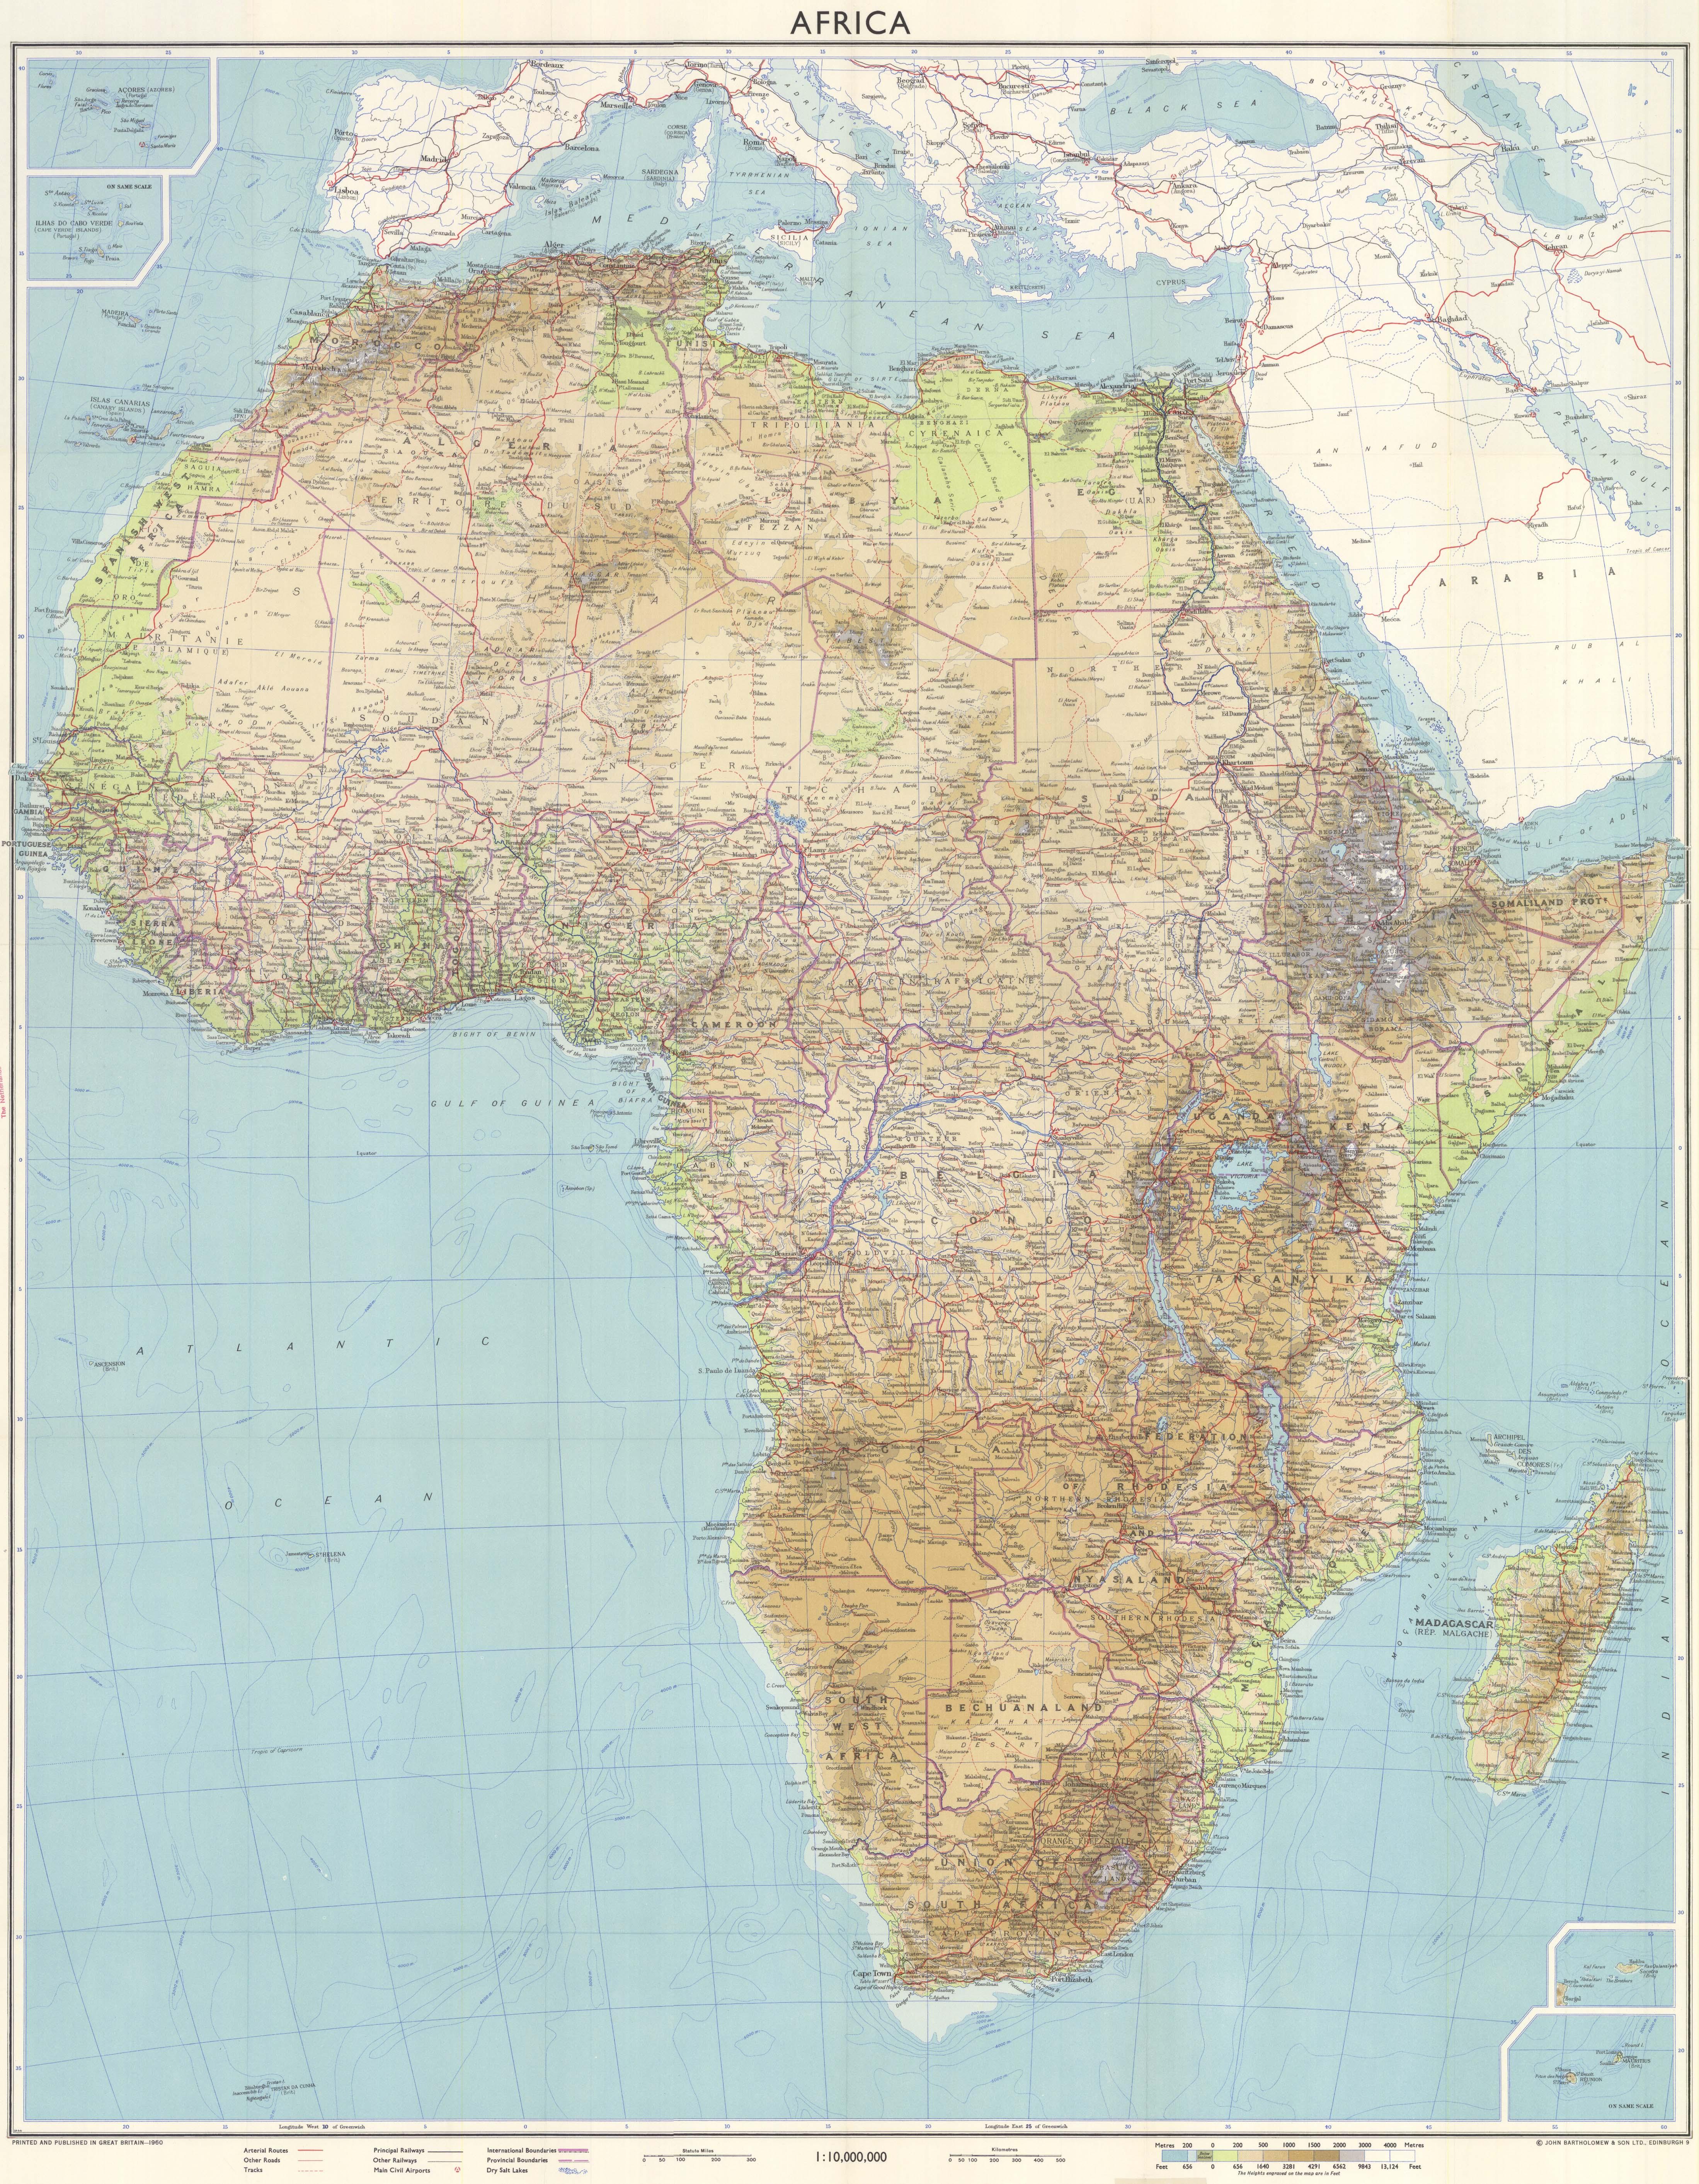 Mapa físico de África 1960